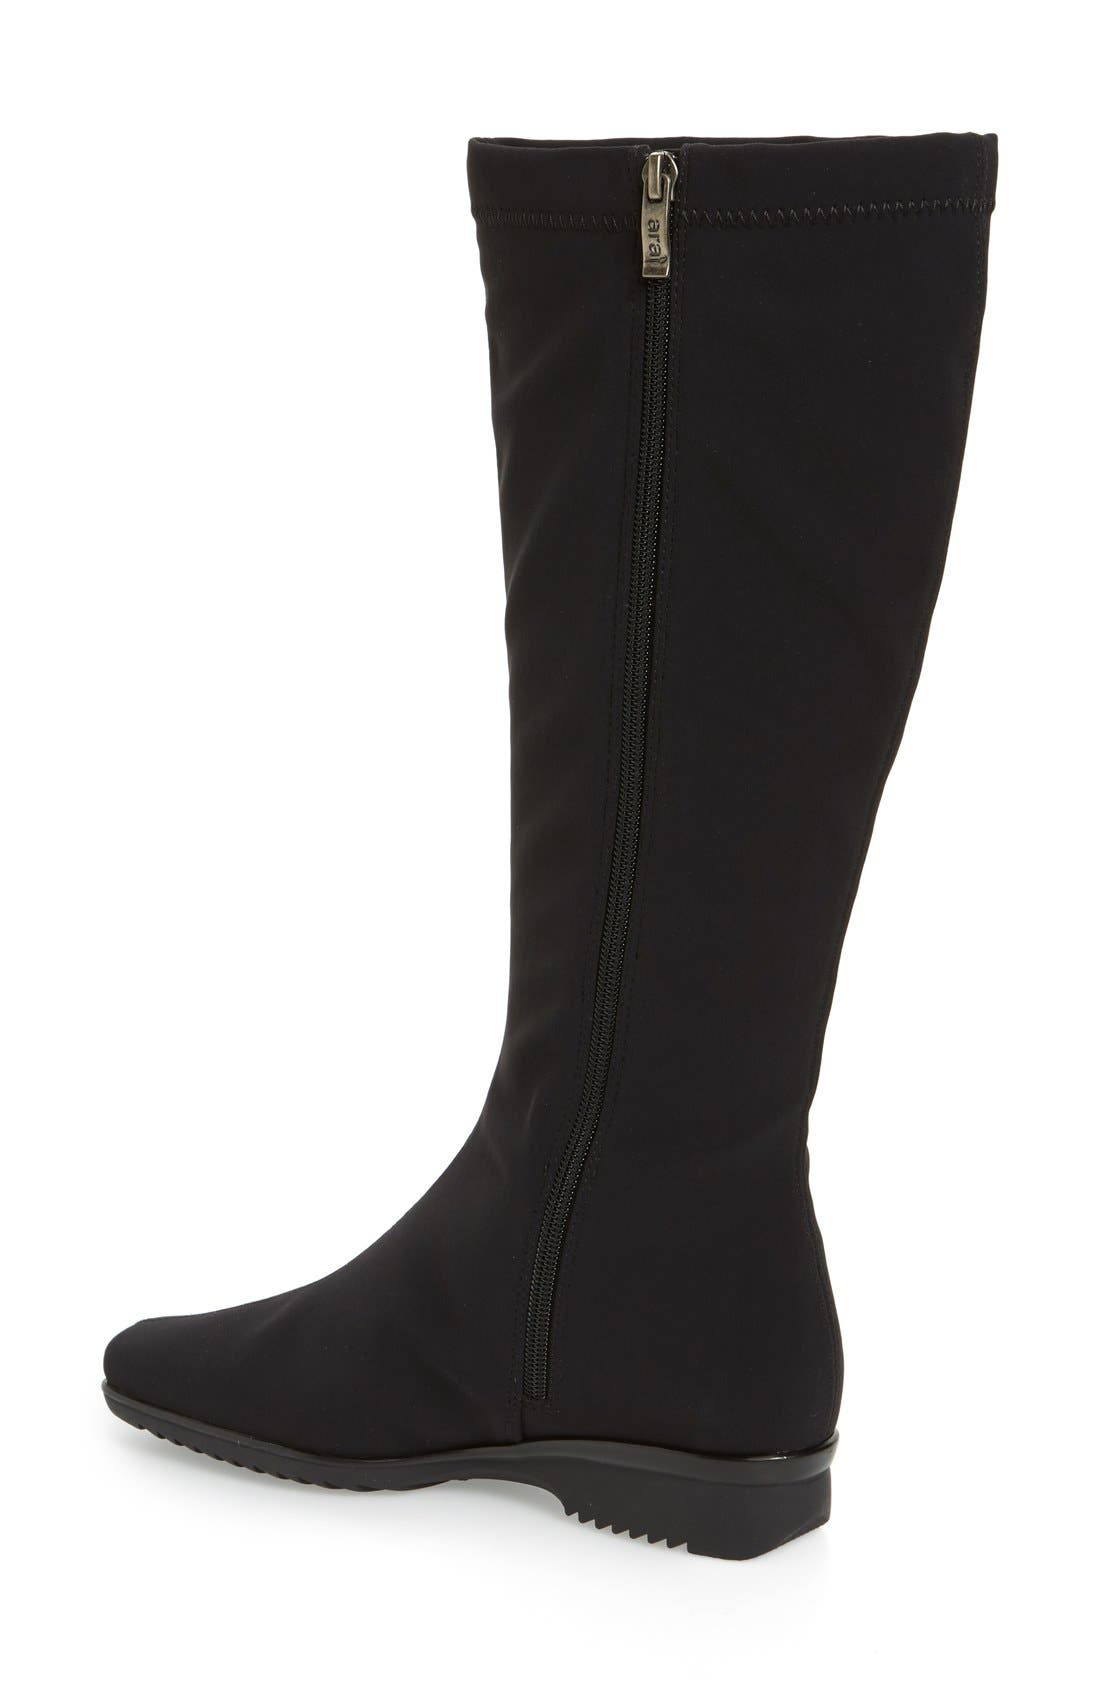 ae5a5f2c9 Women s Ara Boots